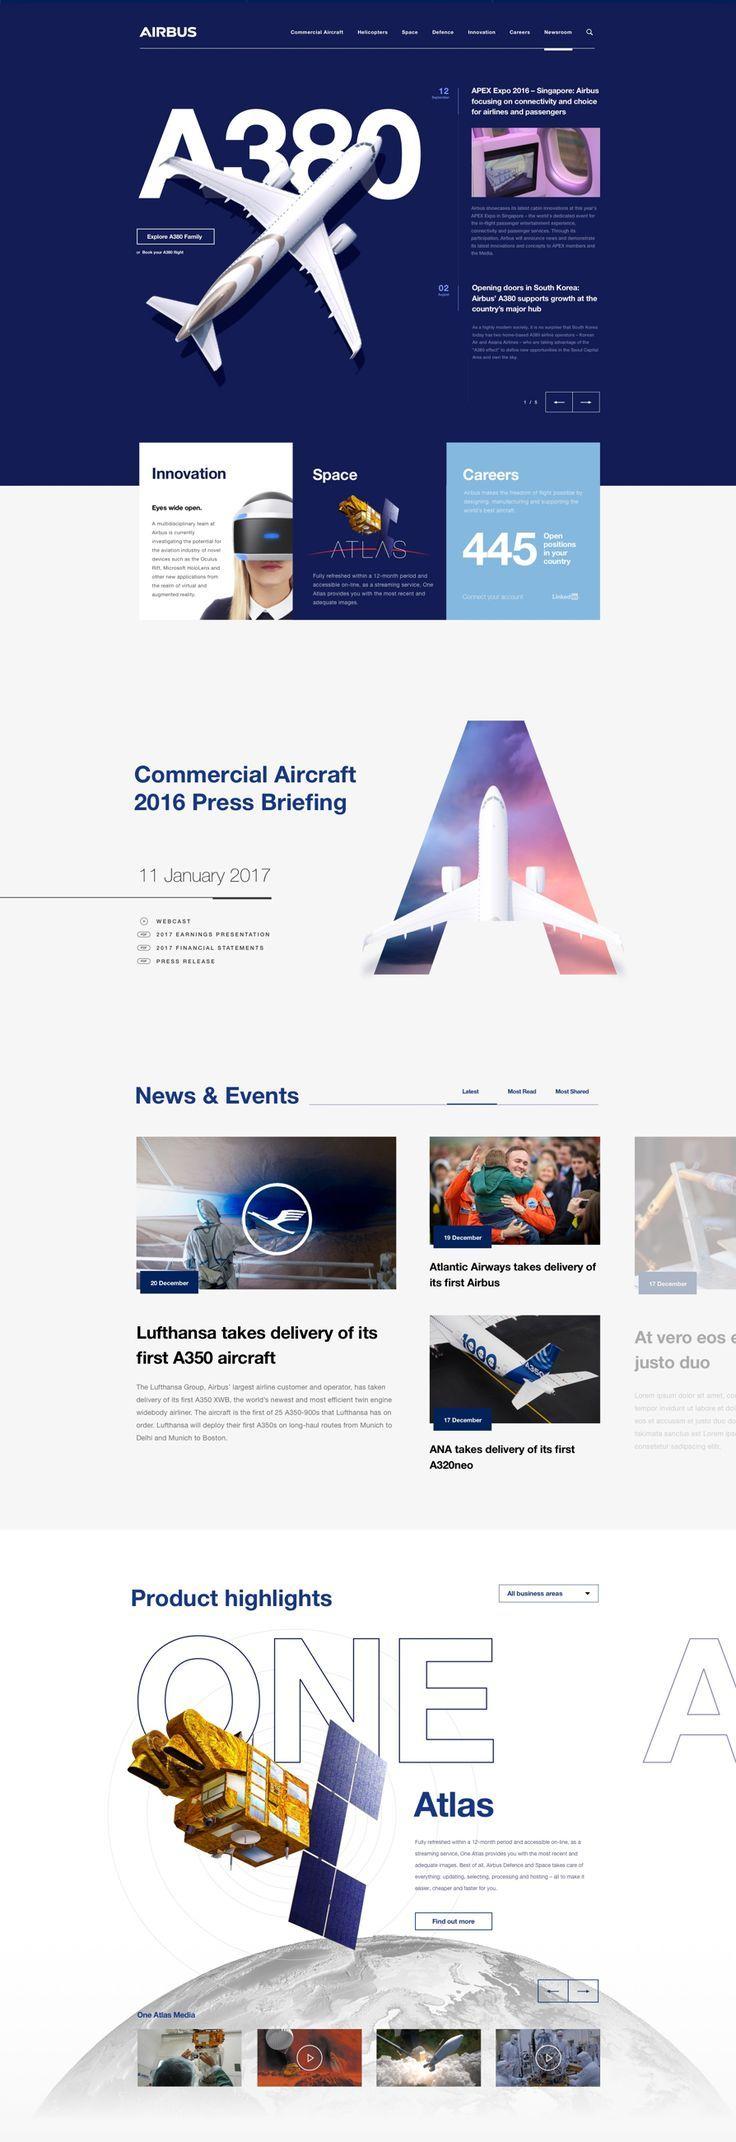 Web Webdesign Design Layout Grid Behance Net Gallery 64562577 Href Design Types